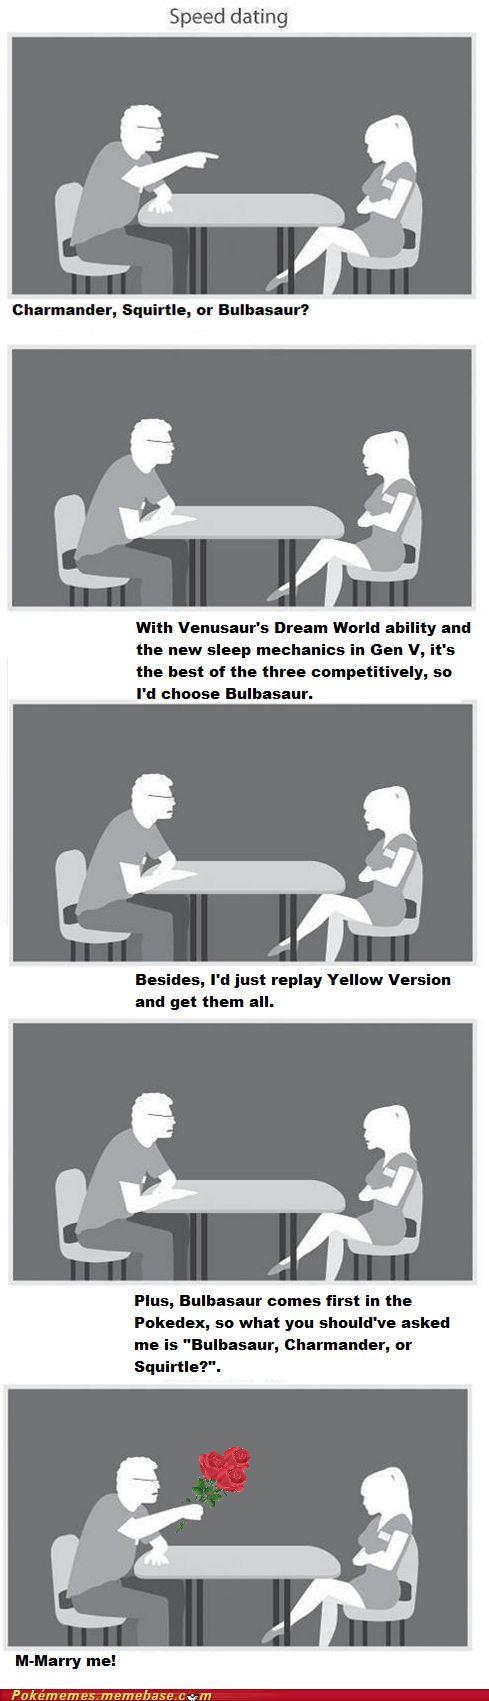 Geek speed dating new york